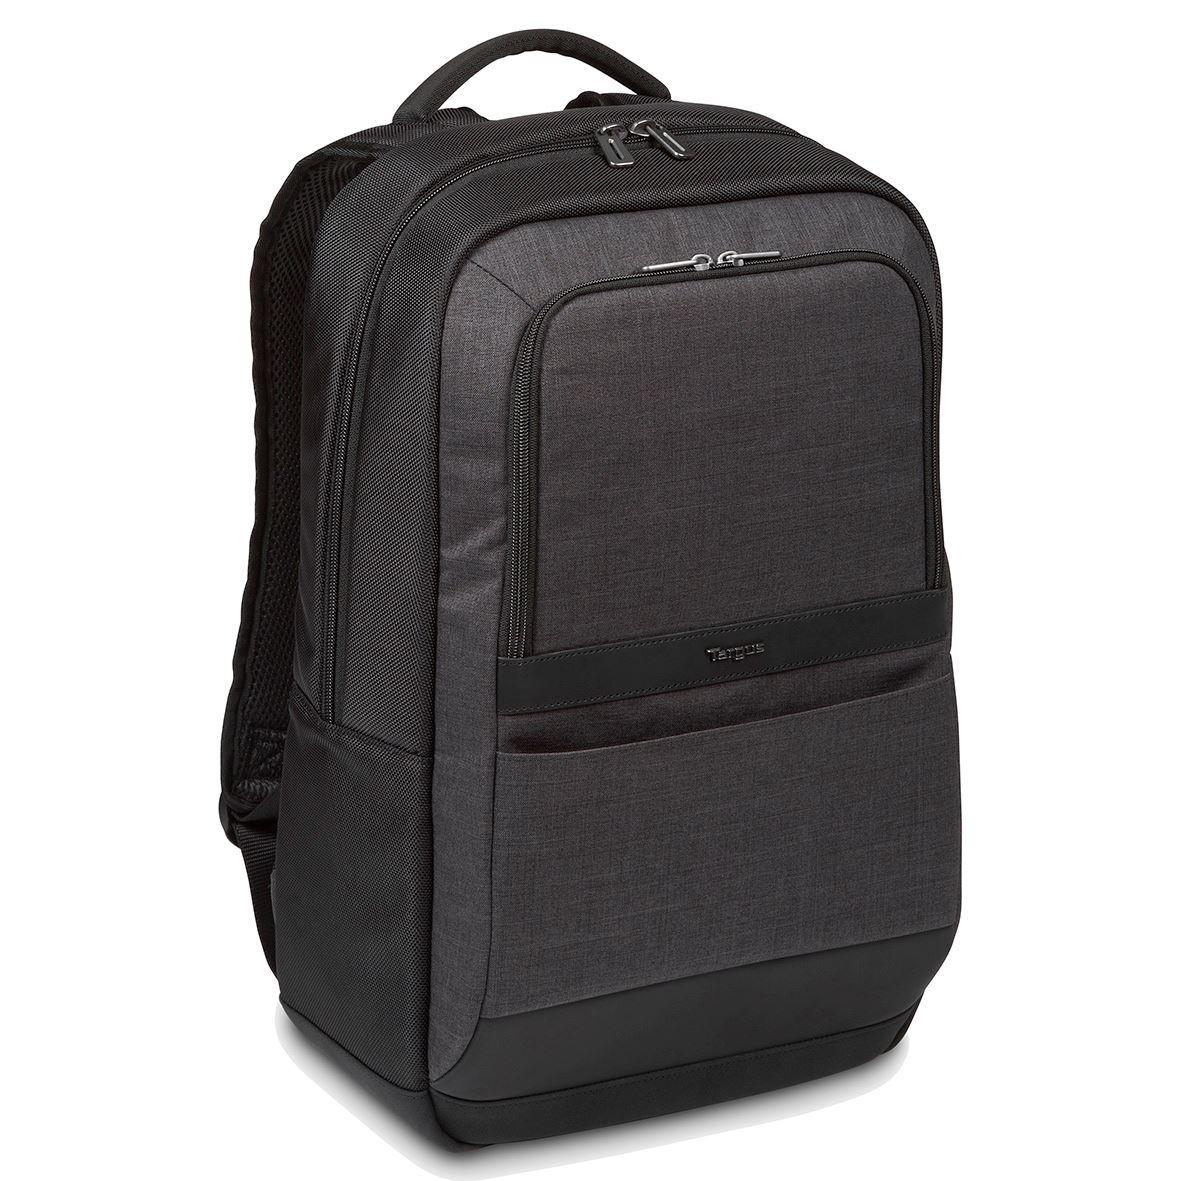 "Targus CitySmart 12.5 13 13.3 14 15 15.6"" Essential Laptop Backpack"